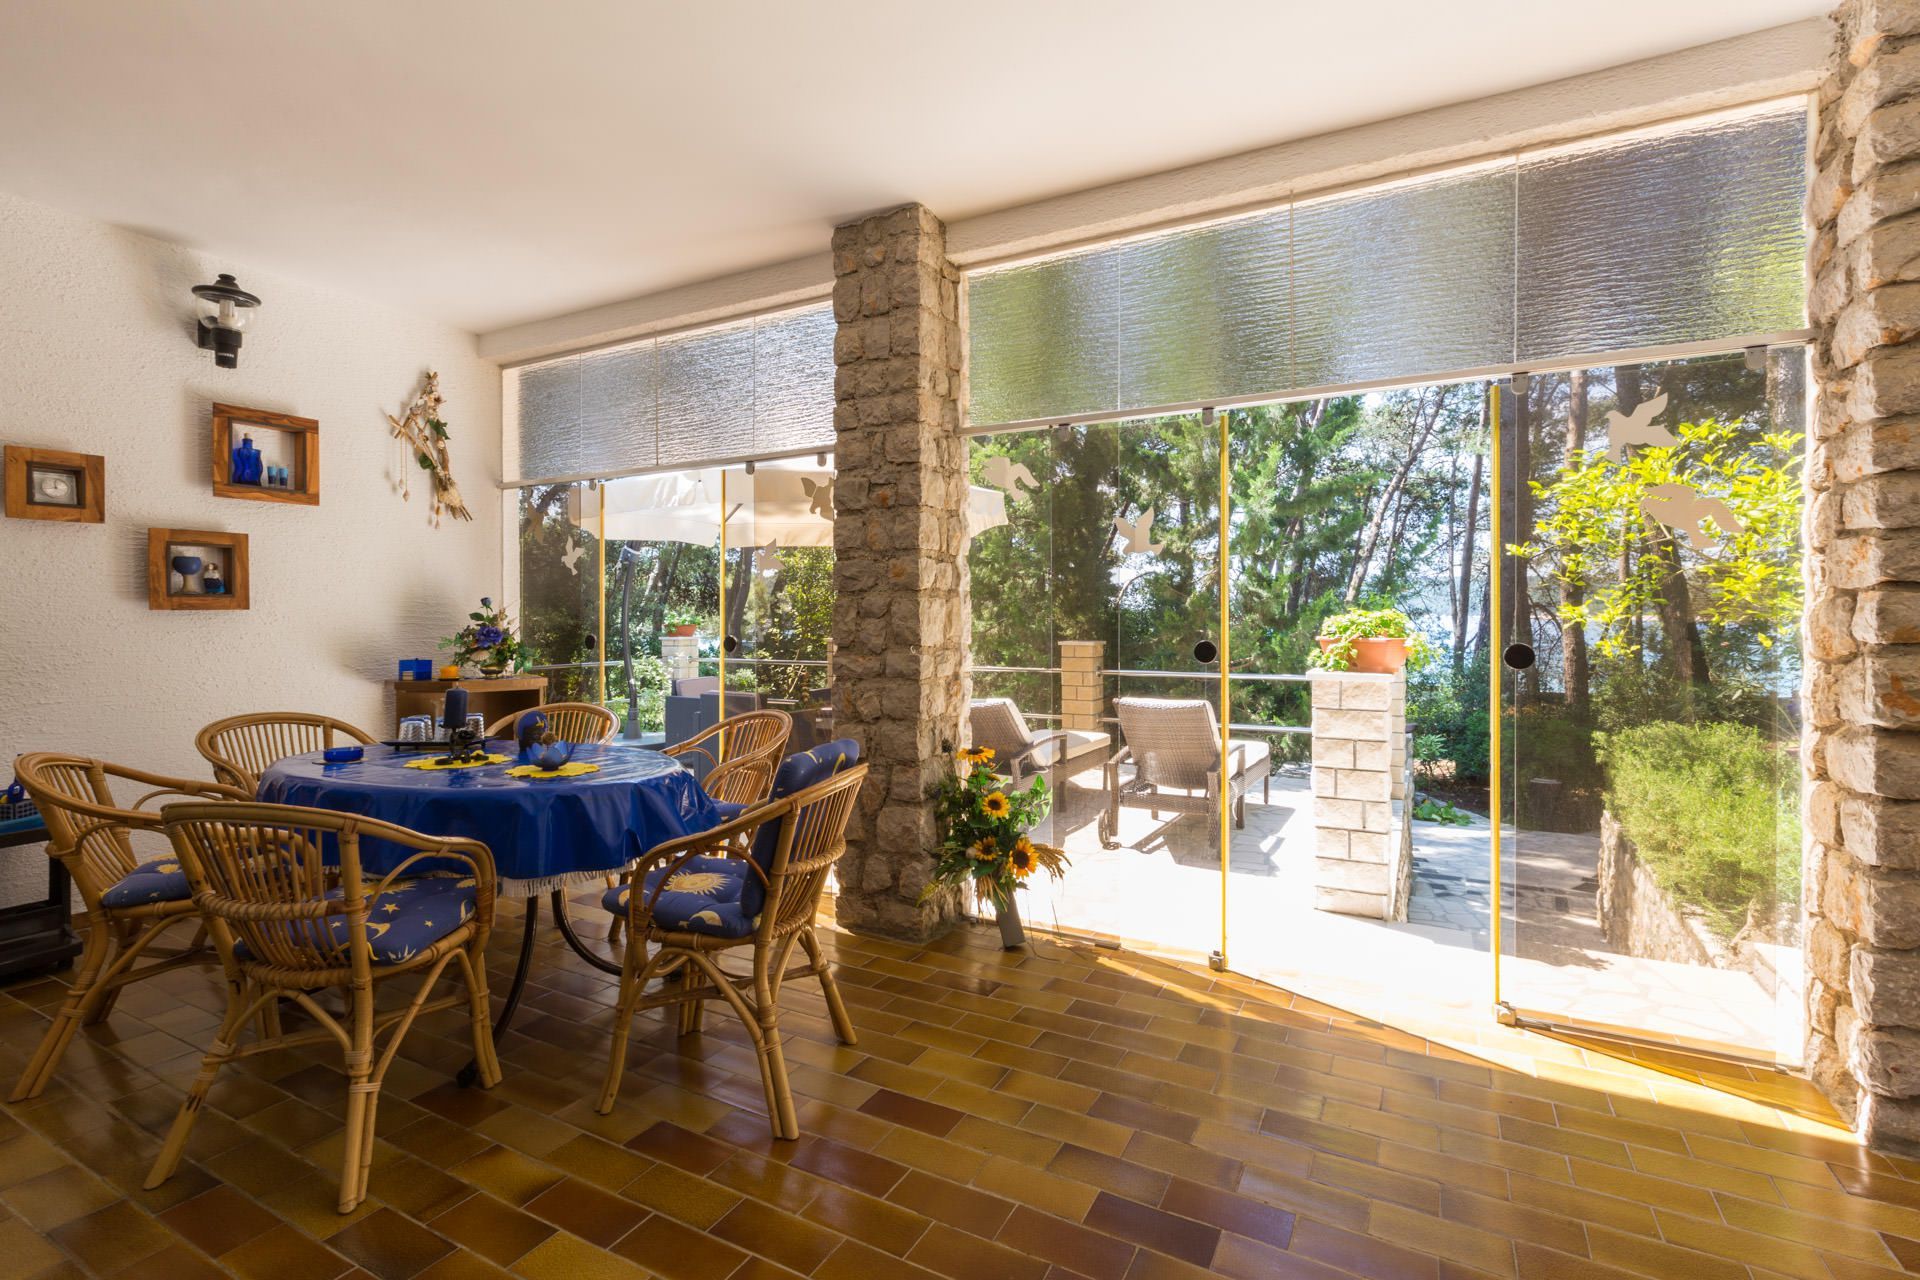 Artatore appartement hr art 04624 zur miete artatore for Veranda englisch